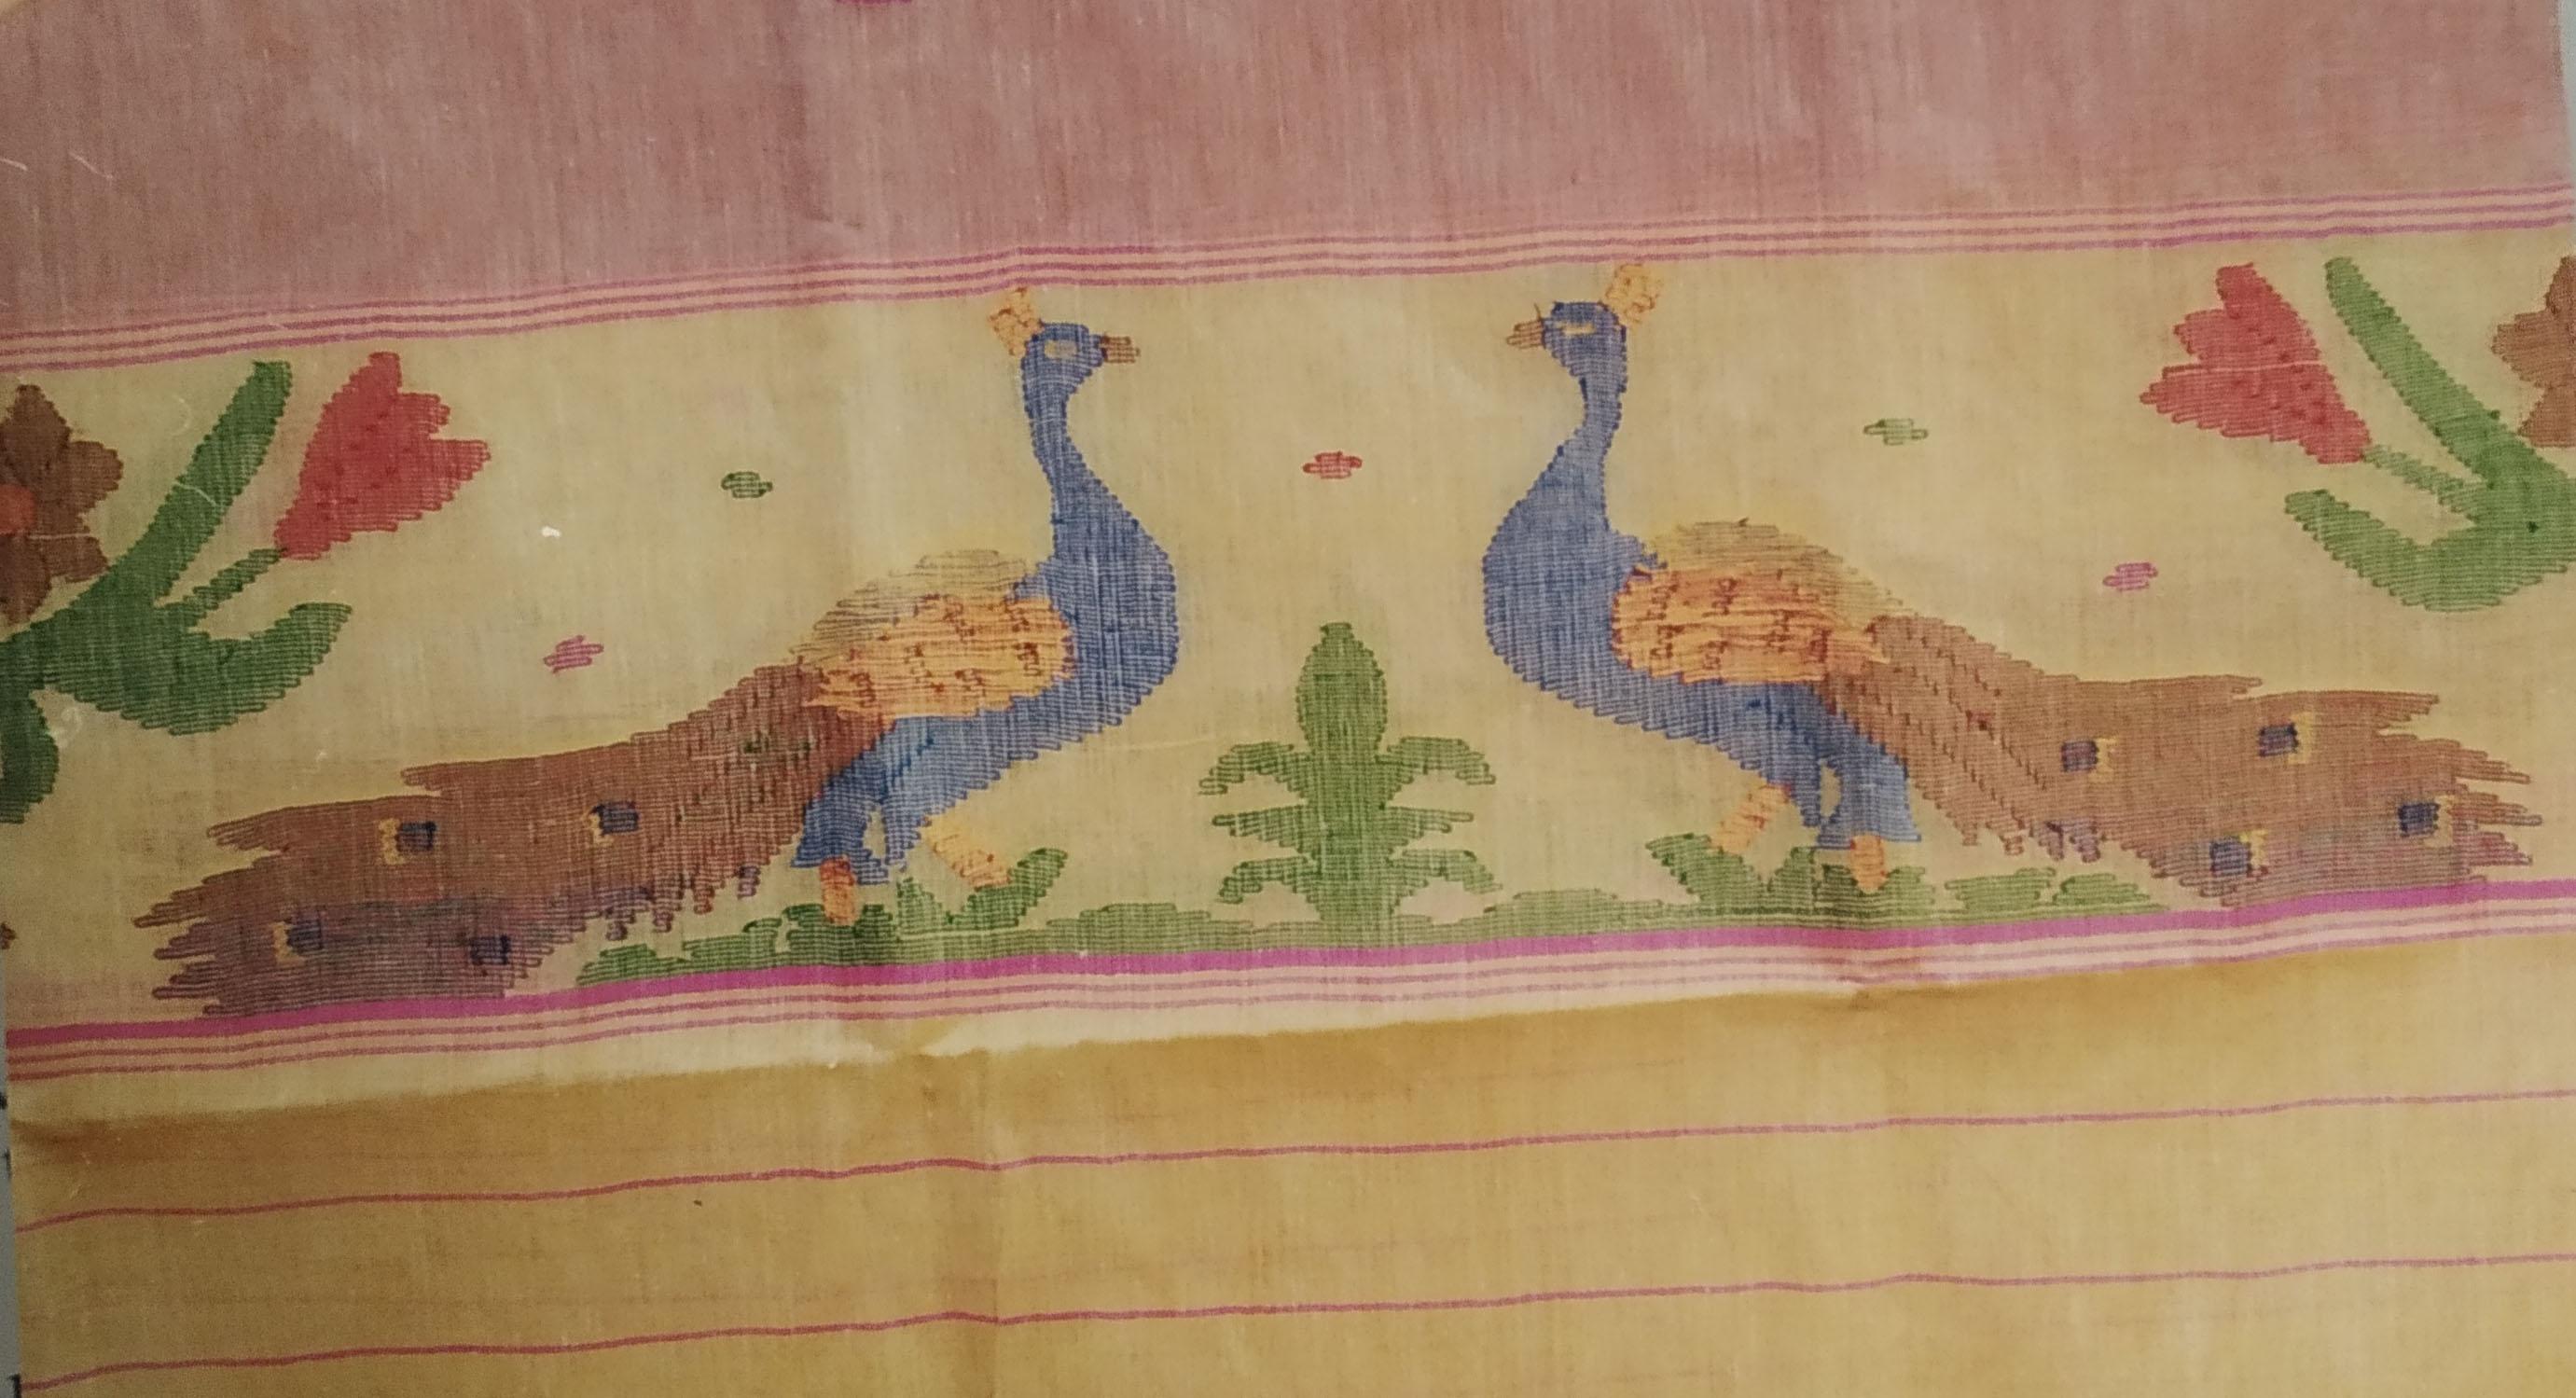 Wangkhei Phee/ Jamdani Weaving of Manipur